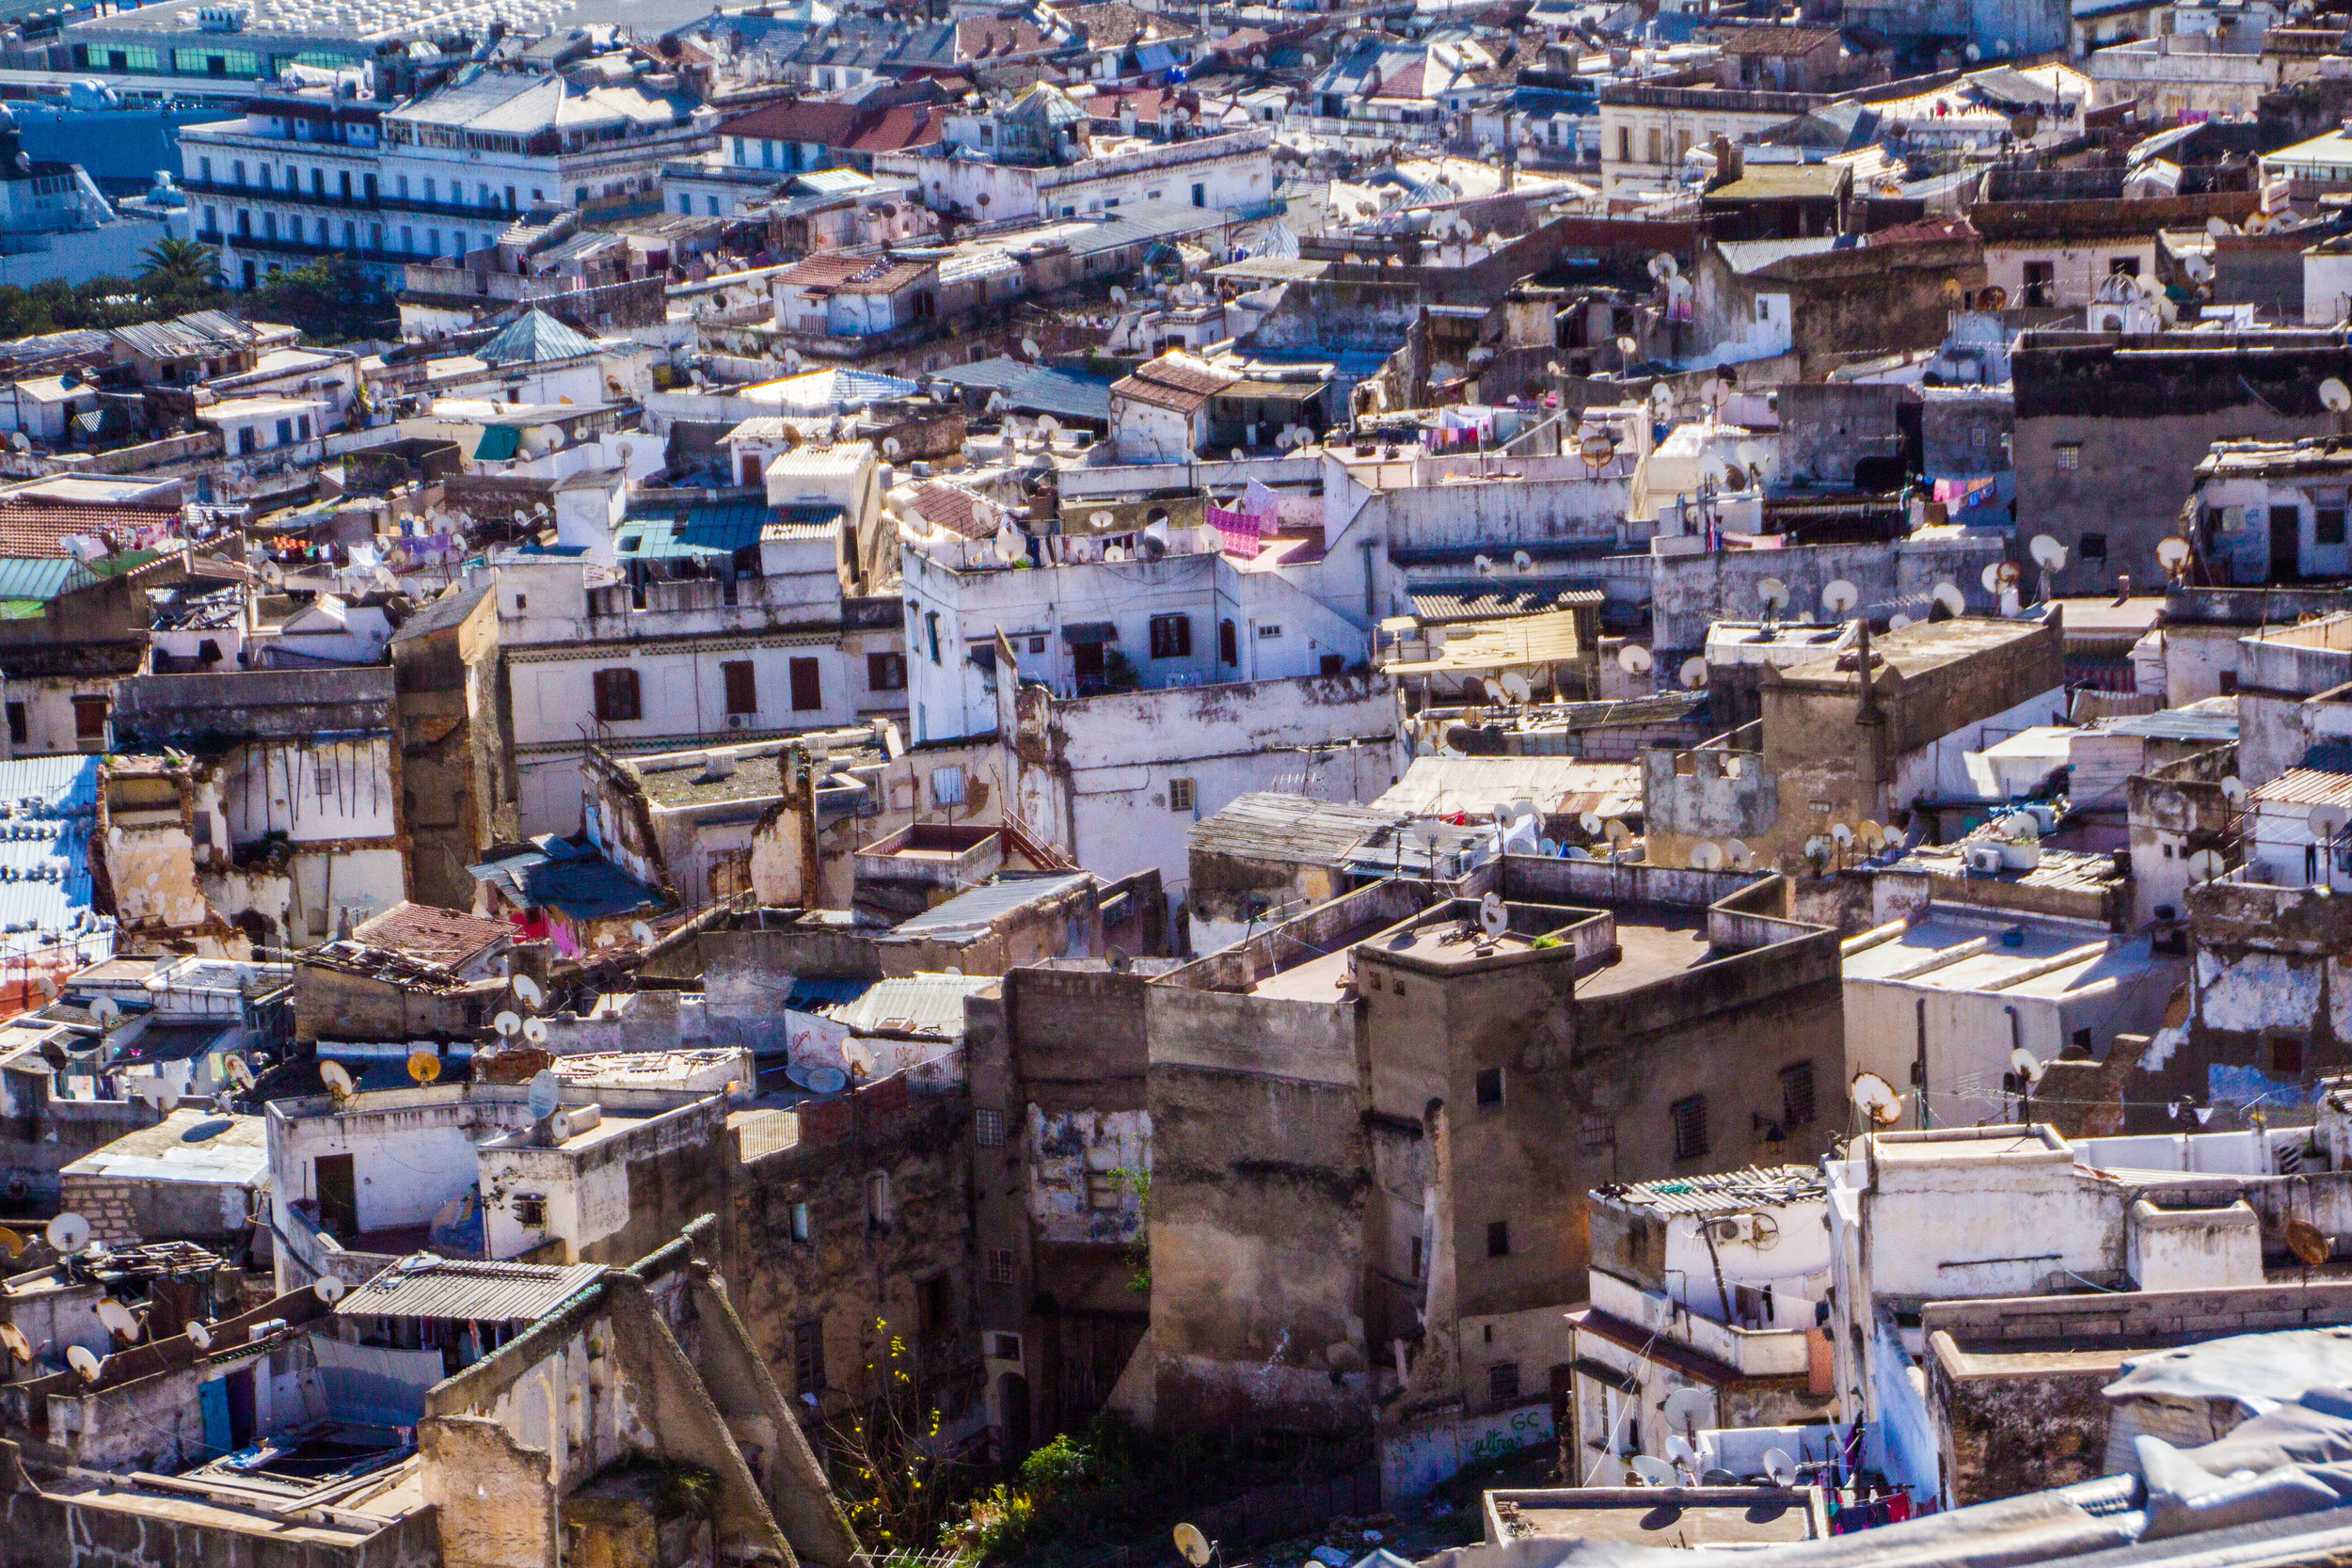 casbah-from-above-algiers-algeria-8.jpg